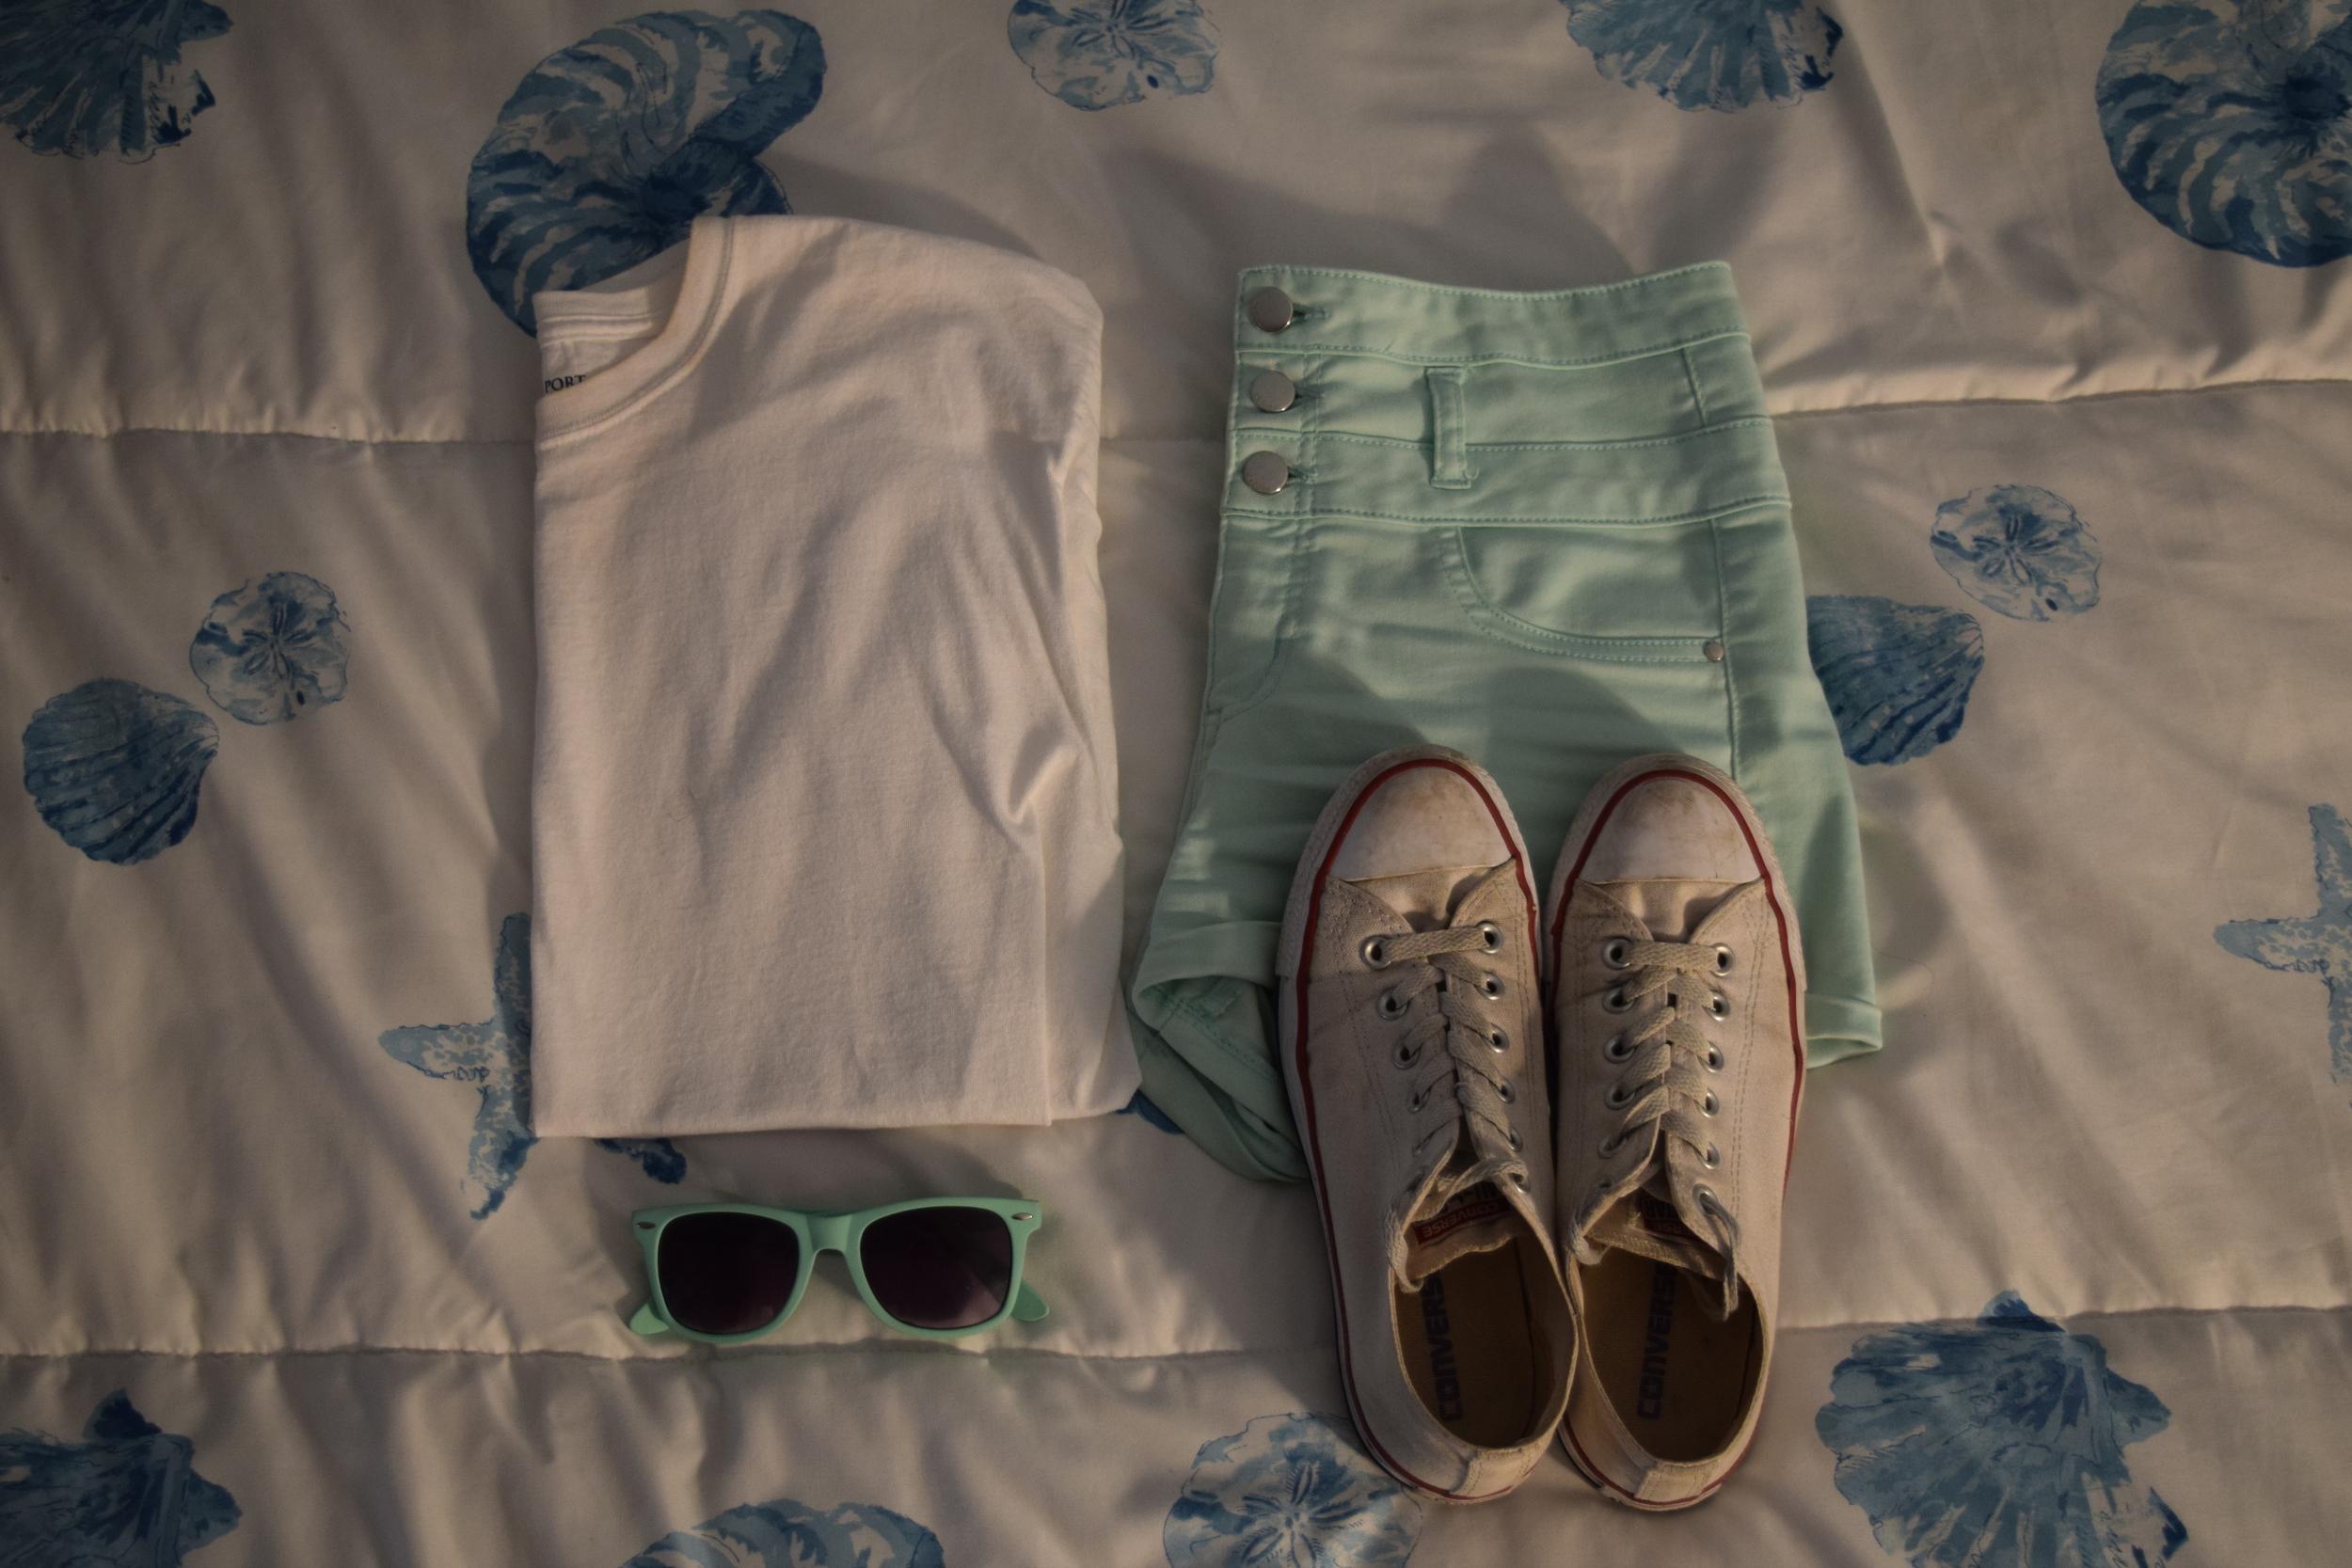 Shirt . Sunglasses (no clue I'm sorry).  Sneakers .  Shorts .